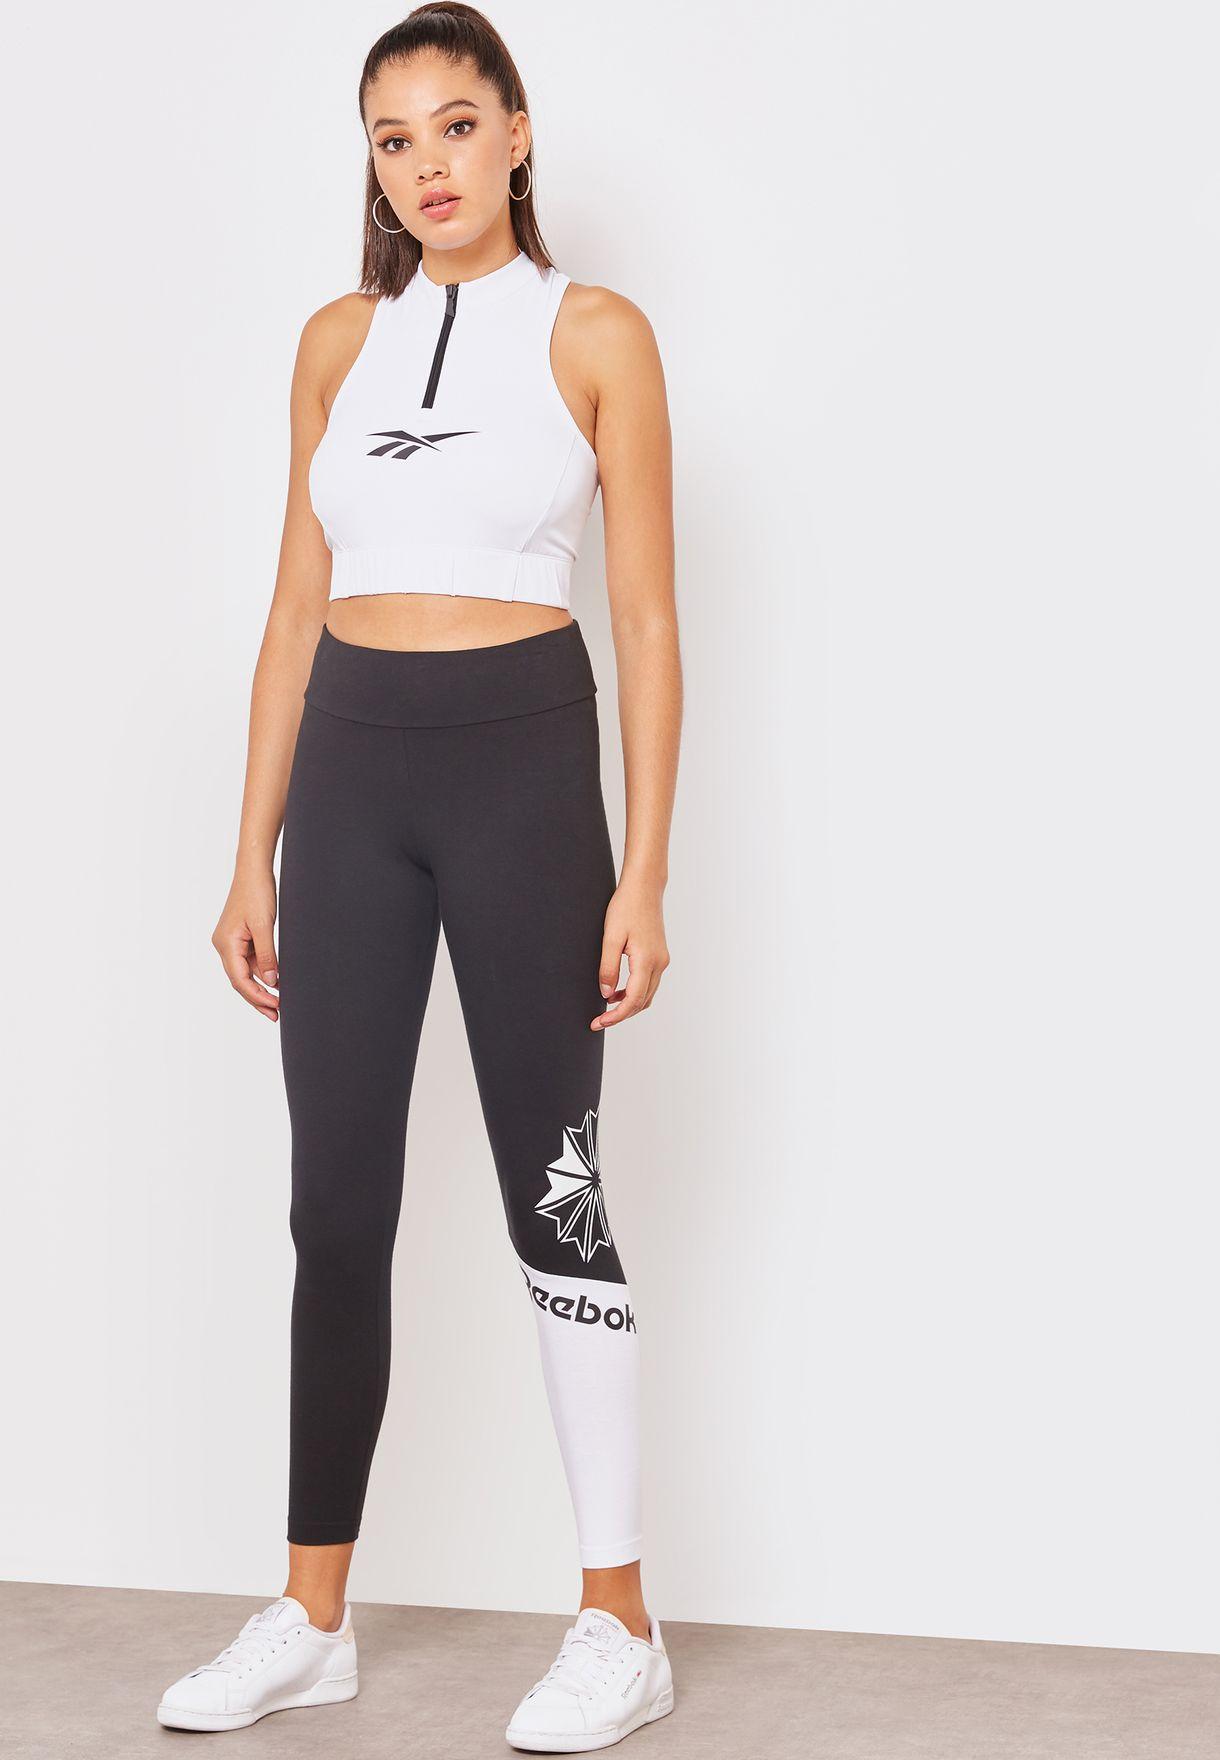 2fef6f5359ee5 Shop Reebok black Classic Leggings DH1335 for Women in Bahrain ...